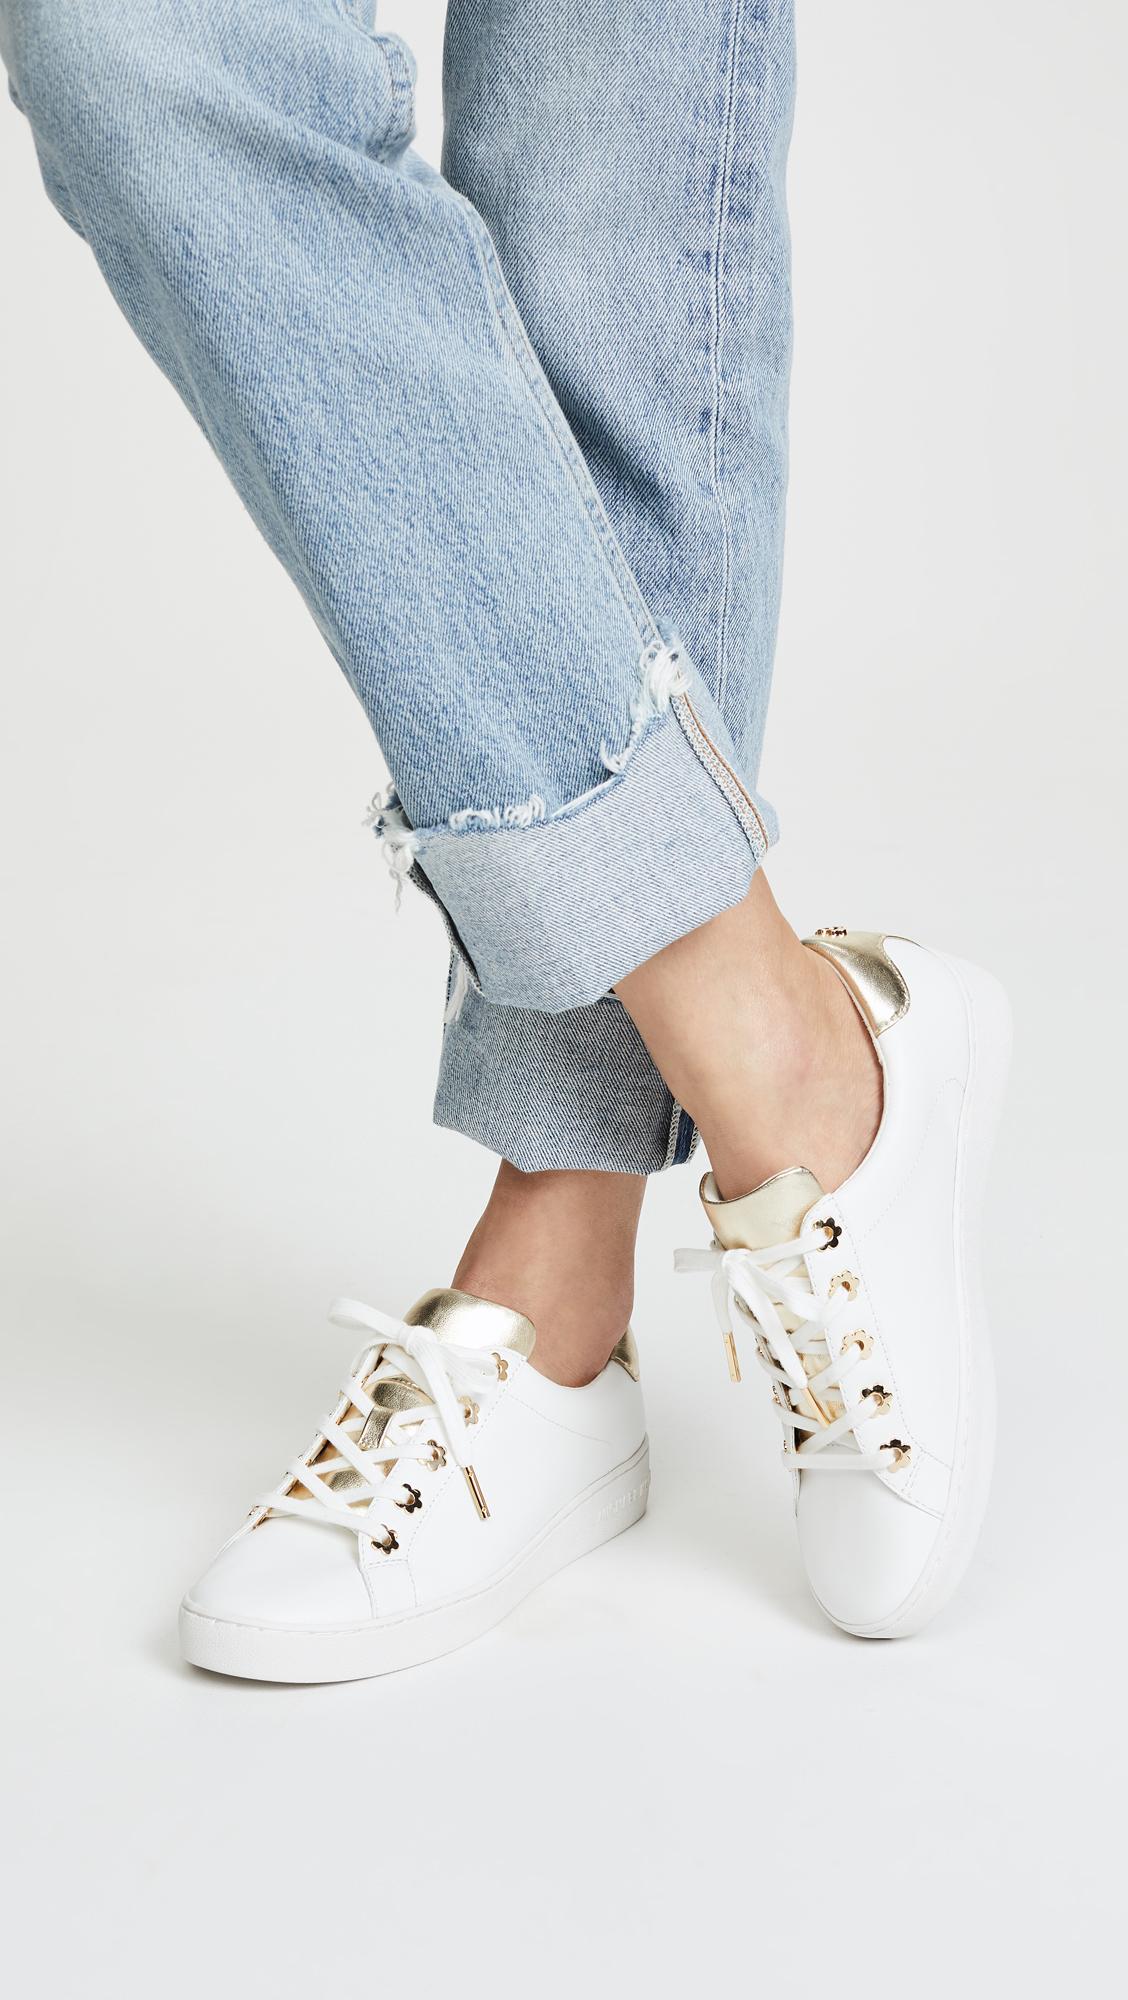 3a93ed83e59 MICHAEL Michael Kors Irving Lace Up Sneakers   SHOPBOP